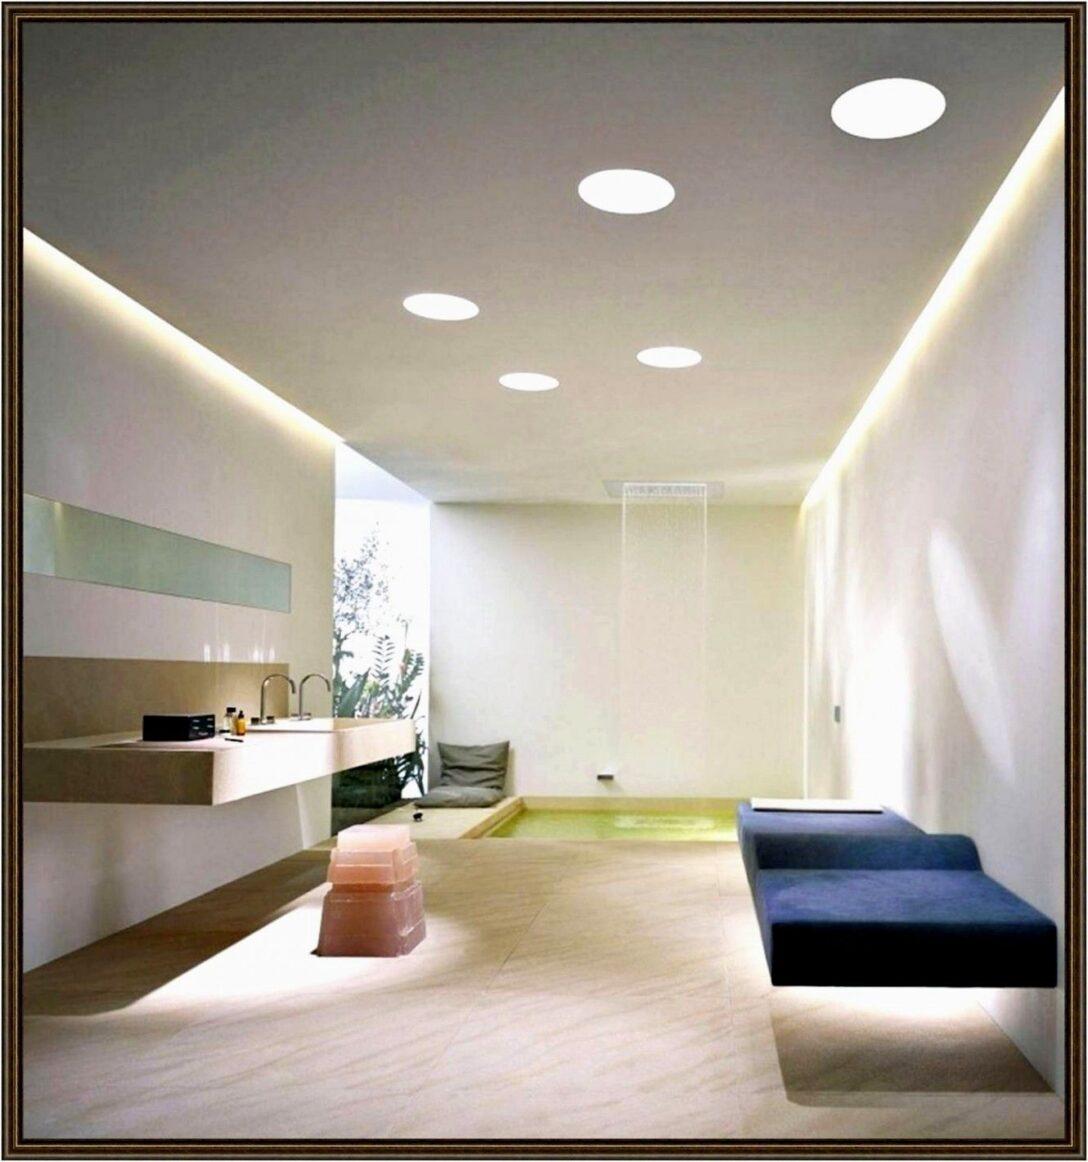 Large Size of Wohnzimmer Led Lampen Einzigartig Landhausstil Sofa Grau Leder Einbauleuchten Bad Beleuchtung Wohnwand Anbauwand Lampe Deckenlampen Für Vorhänge Kunstleder Wohnzimmer Wohnzimmer Led